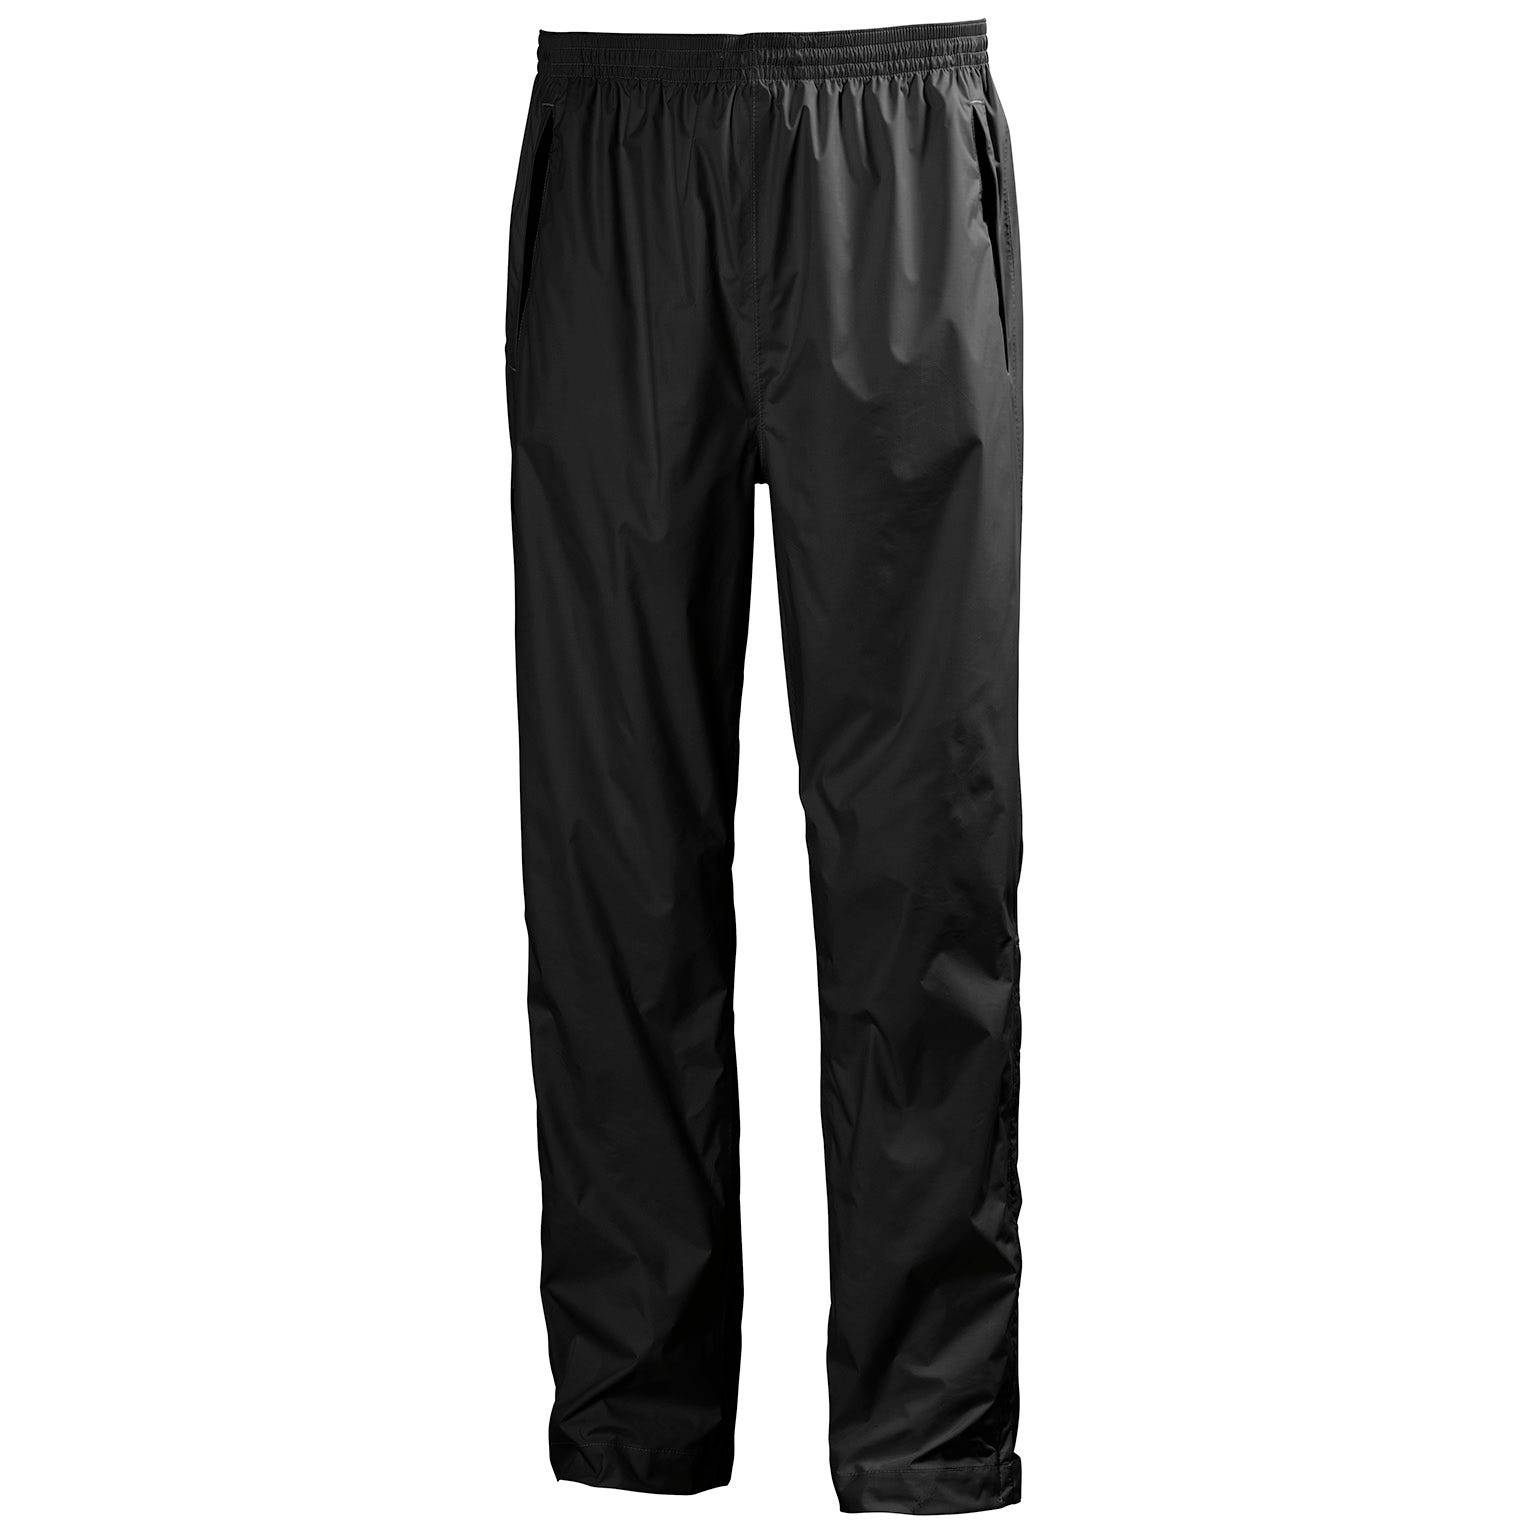 Helly Hansen Loke Pants Mens Hiking Pant Black XXXL